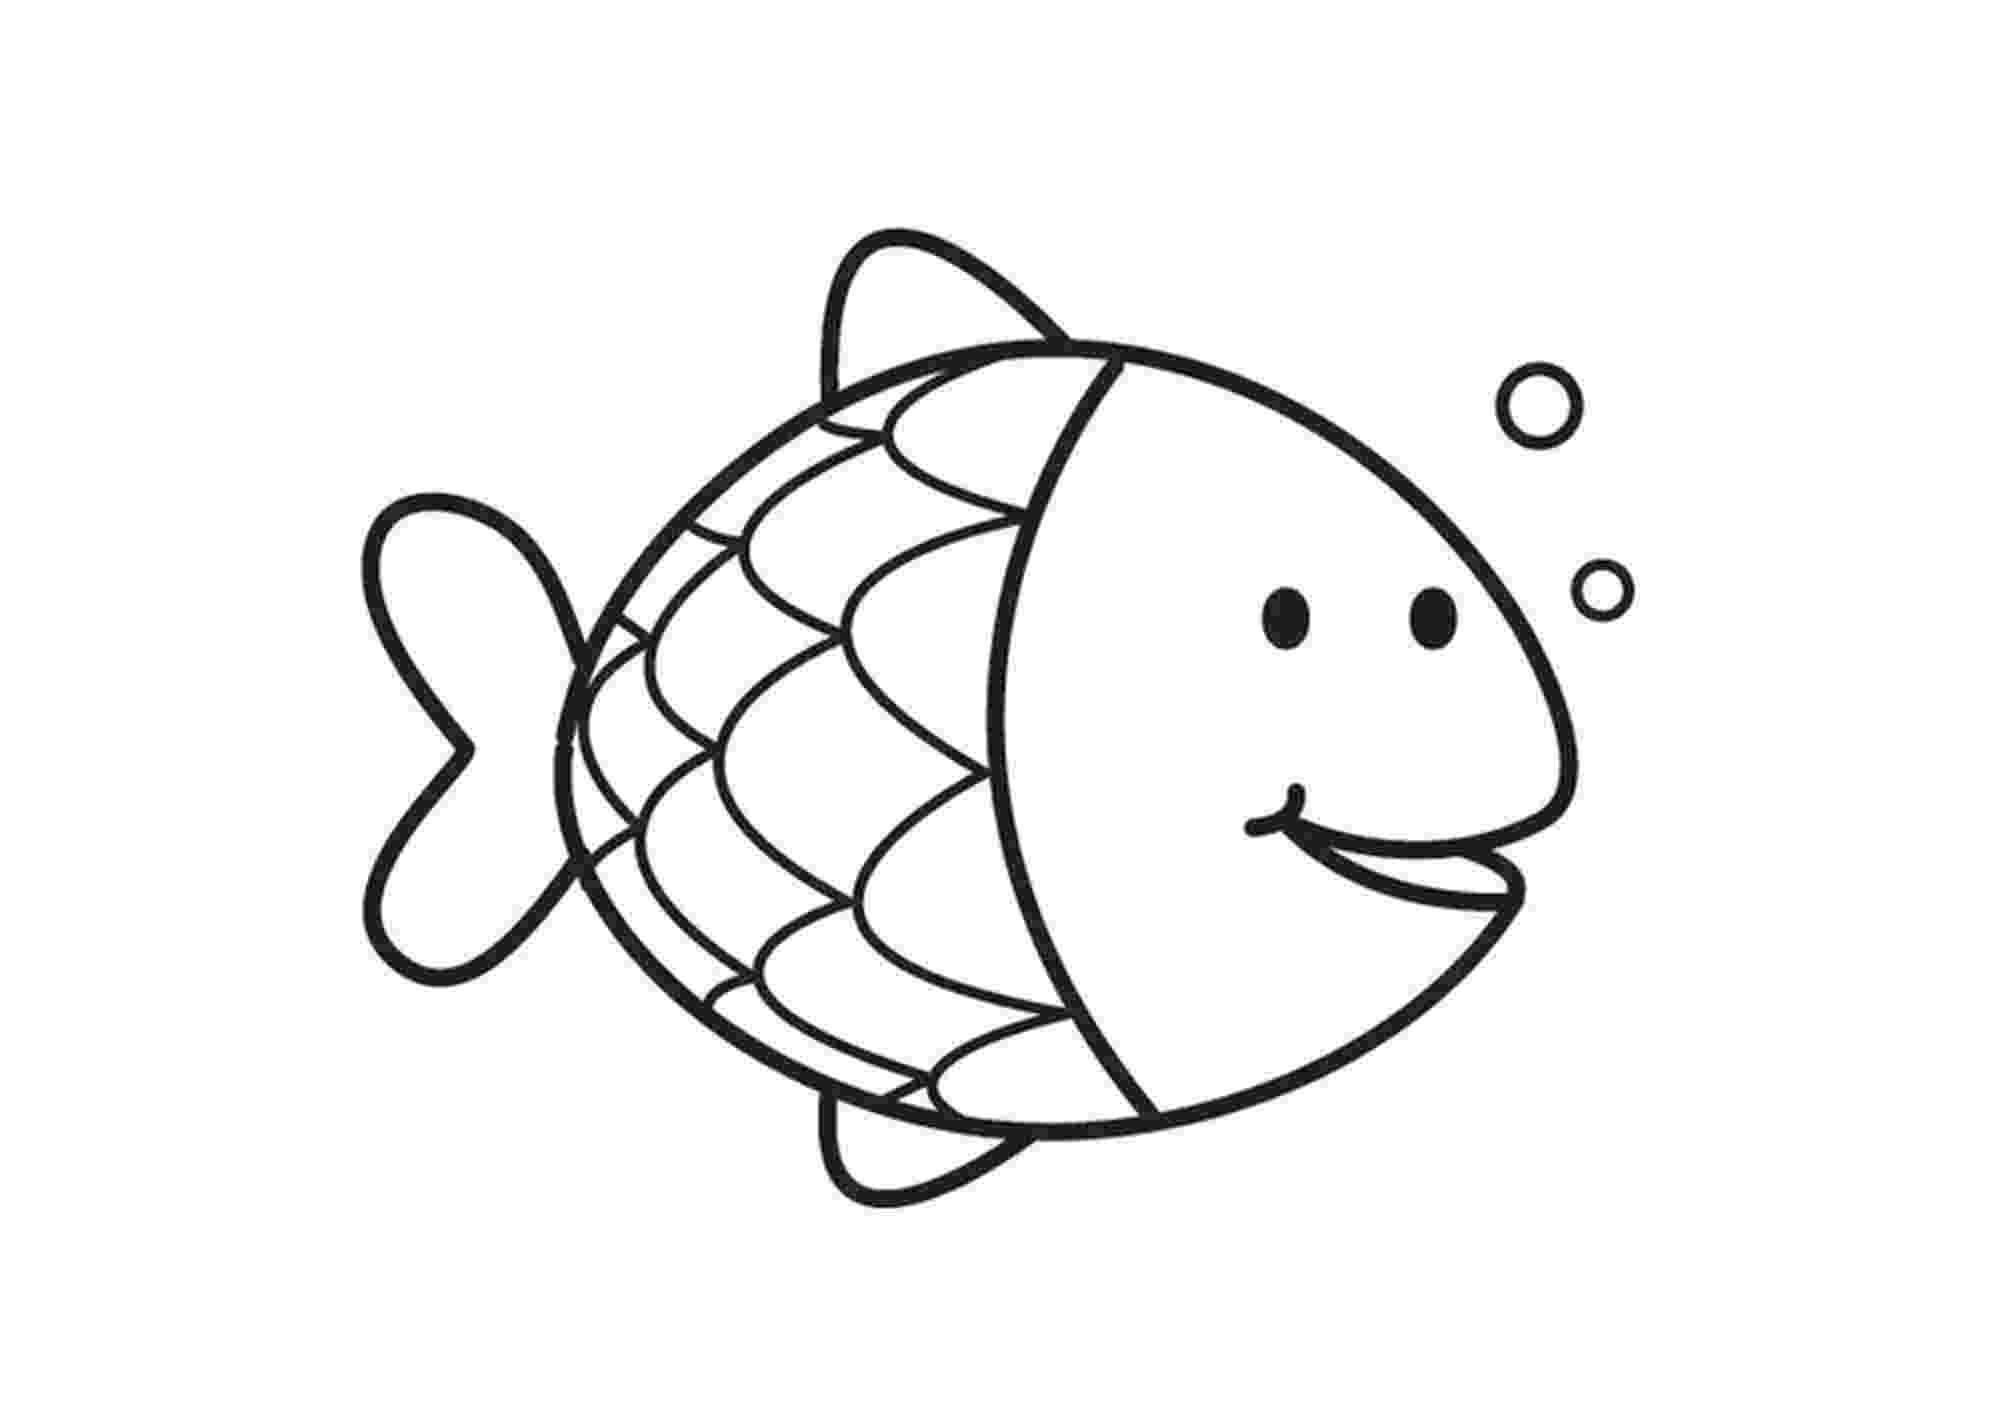 fish coloring page free printable fish coloring pages for kids cool2bkids fish coloring page